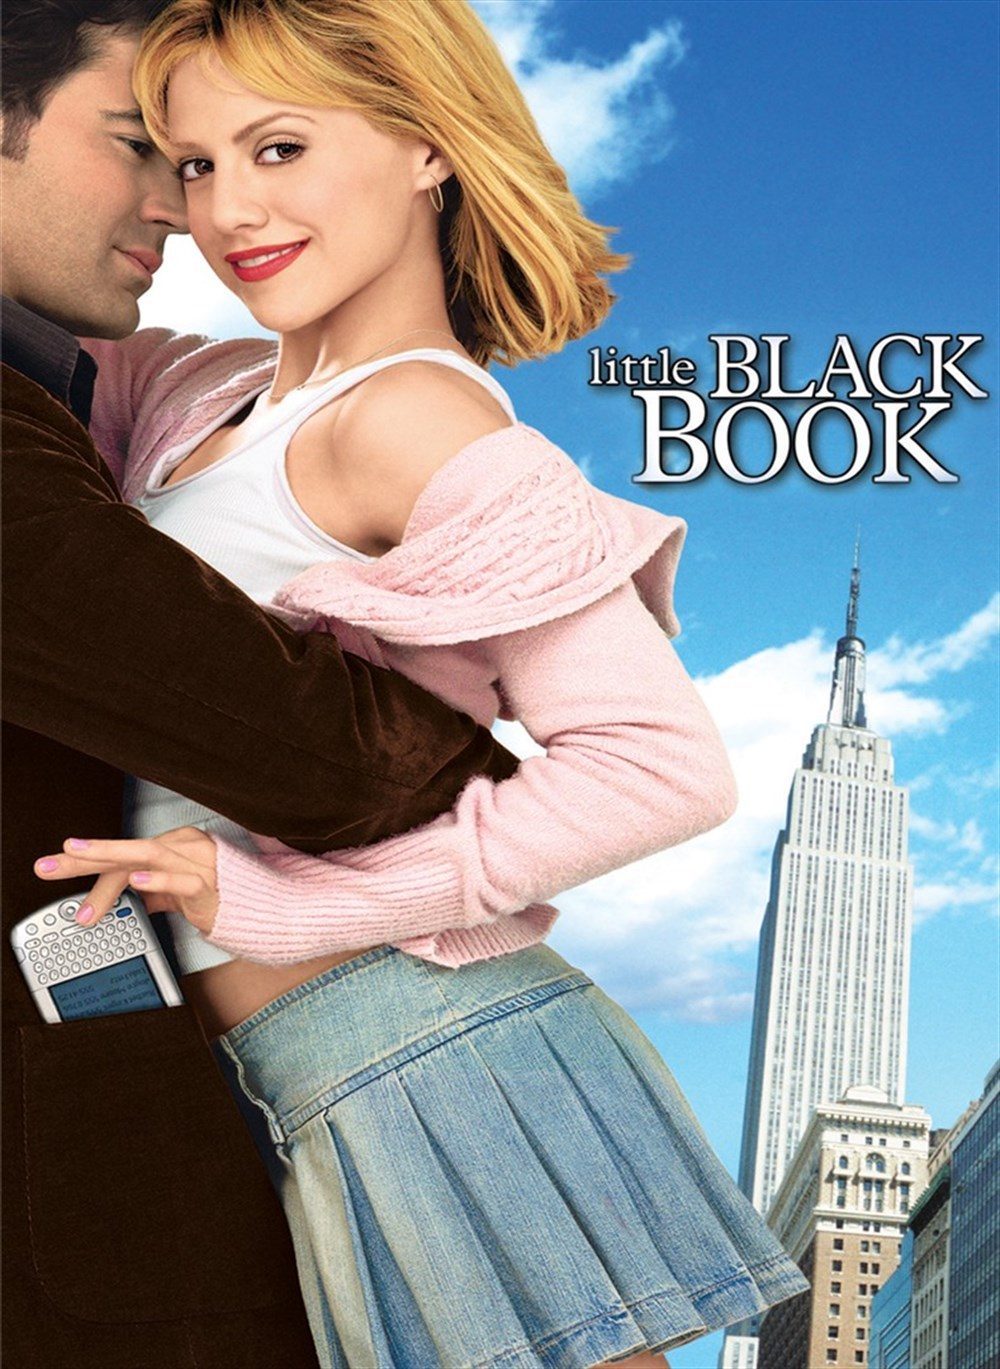 Little Black Book - Microsoft Store